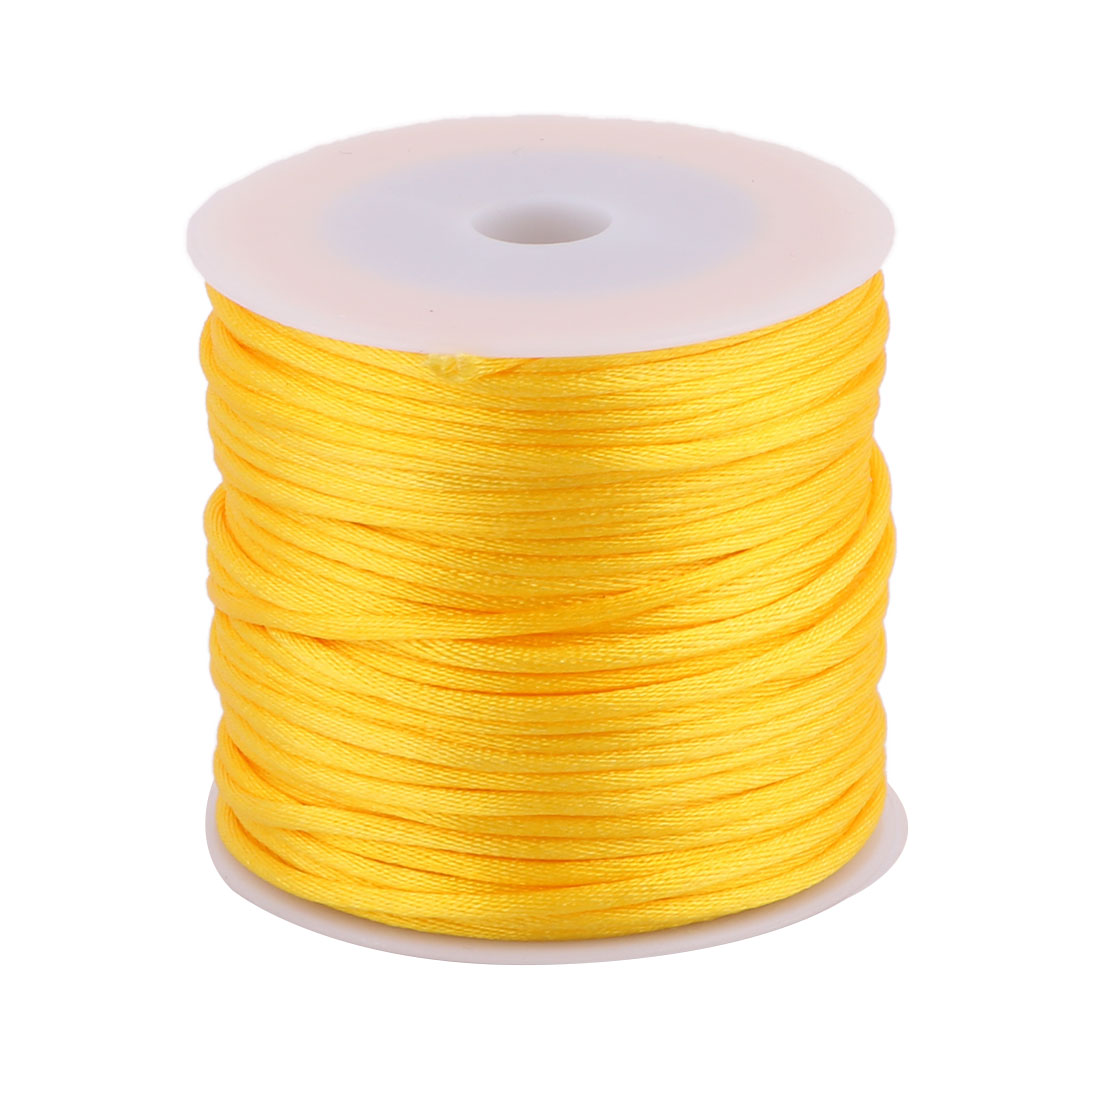 Nylon Handicraft Adornment Chinese Knot String Yellow 2mm Dia 49 Yards